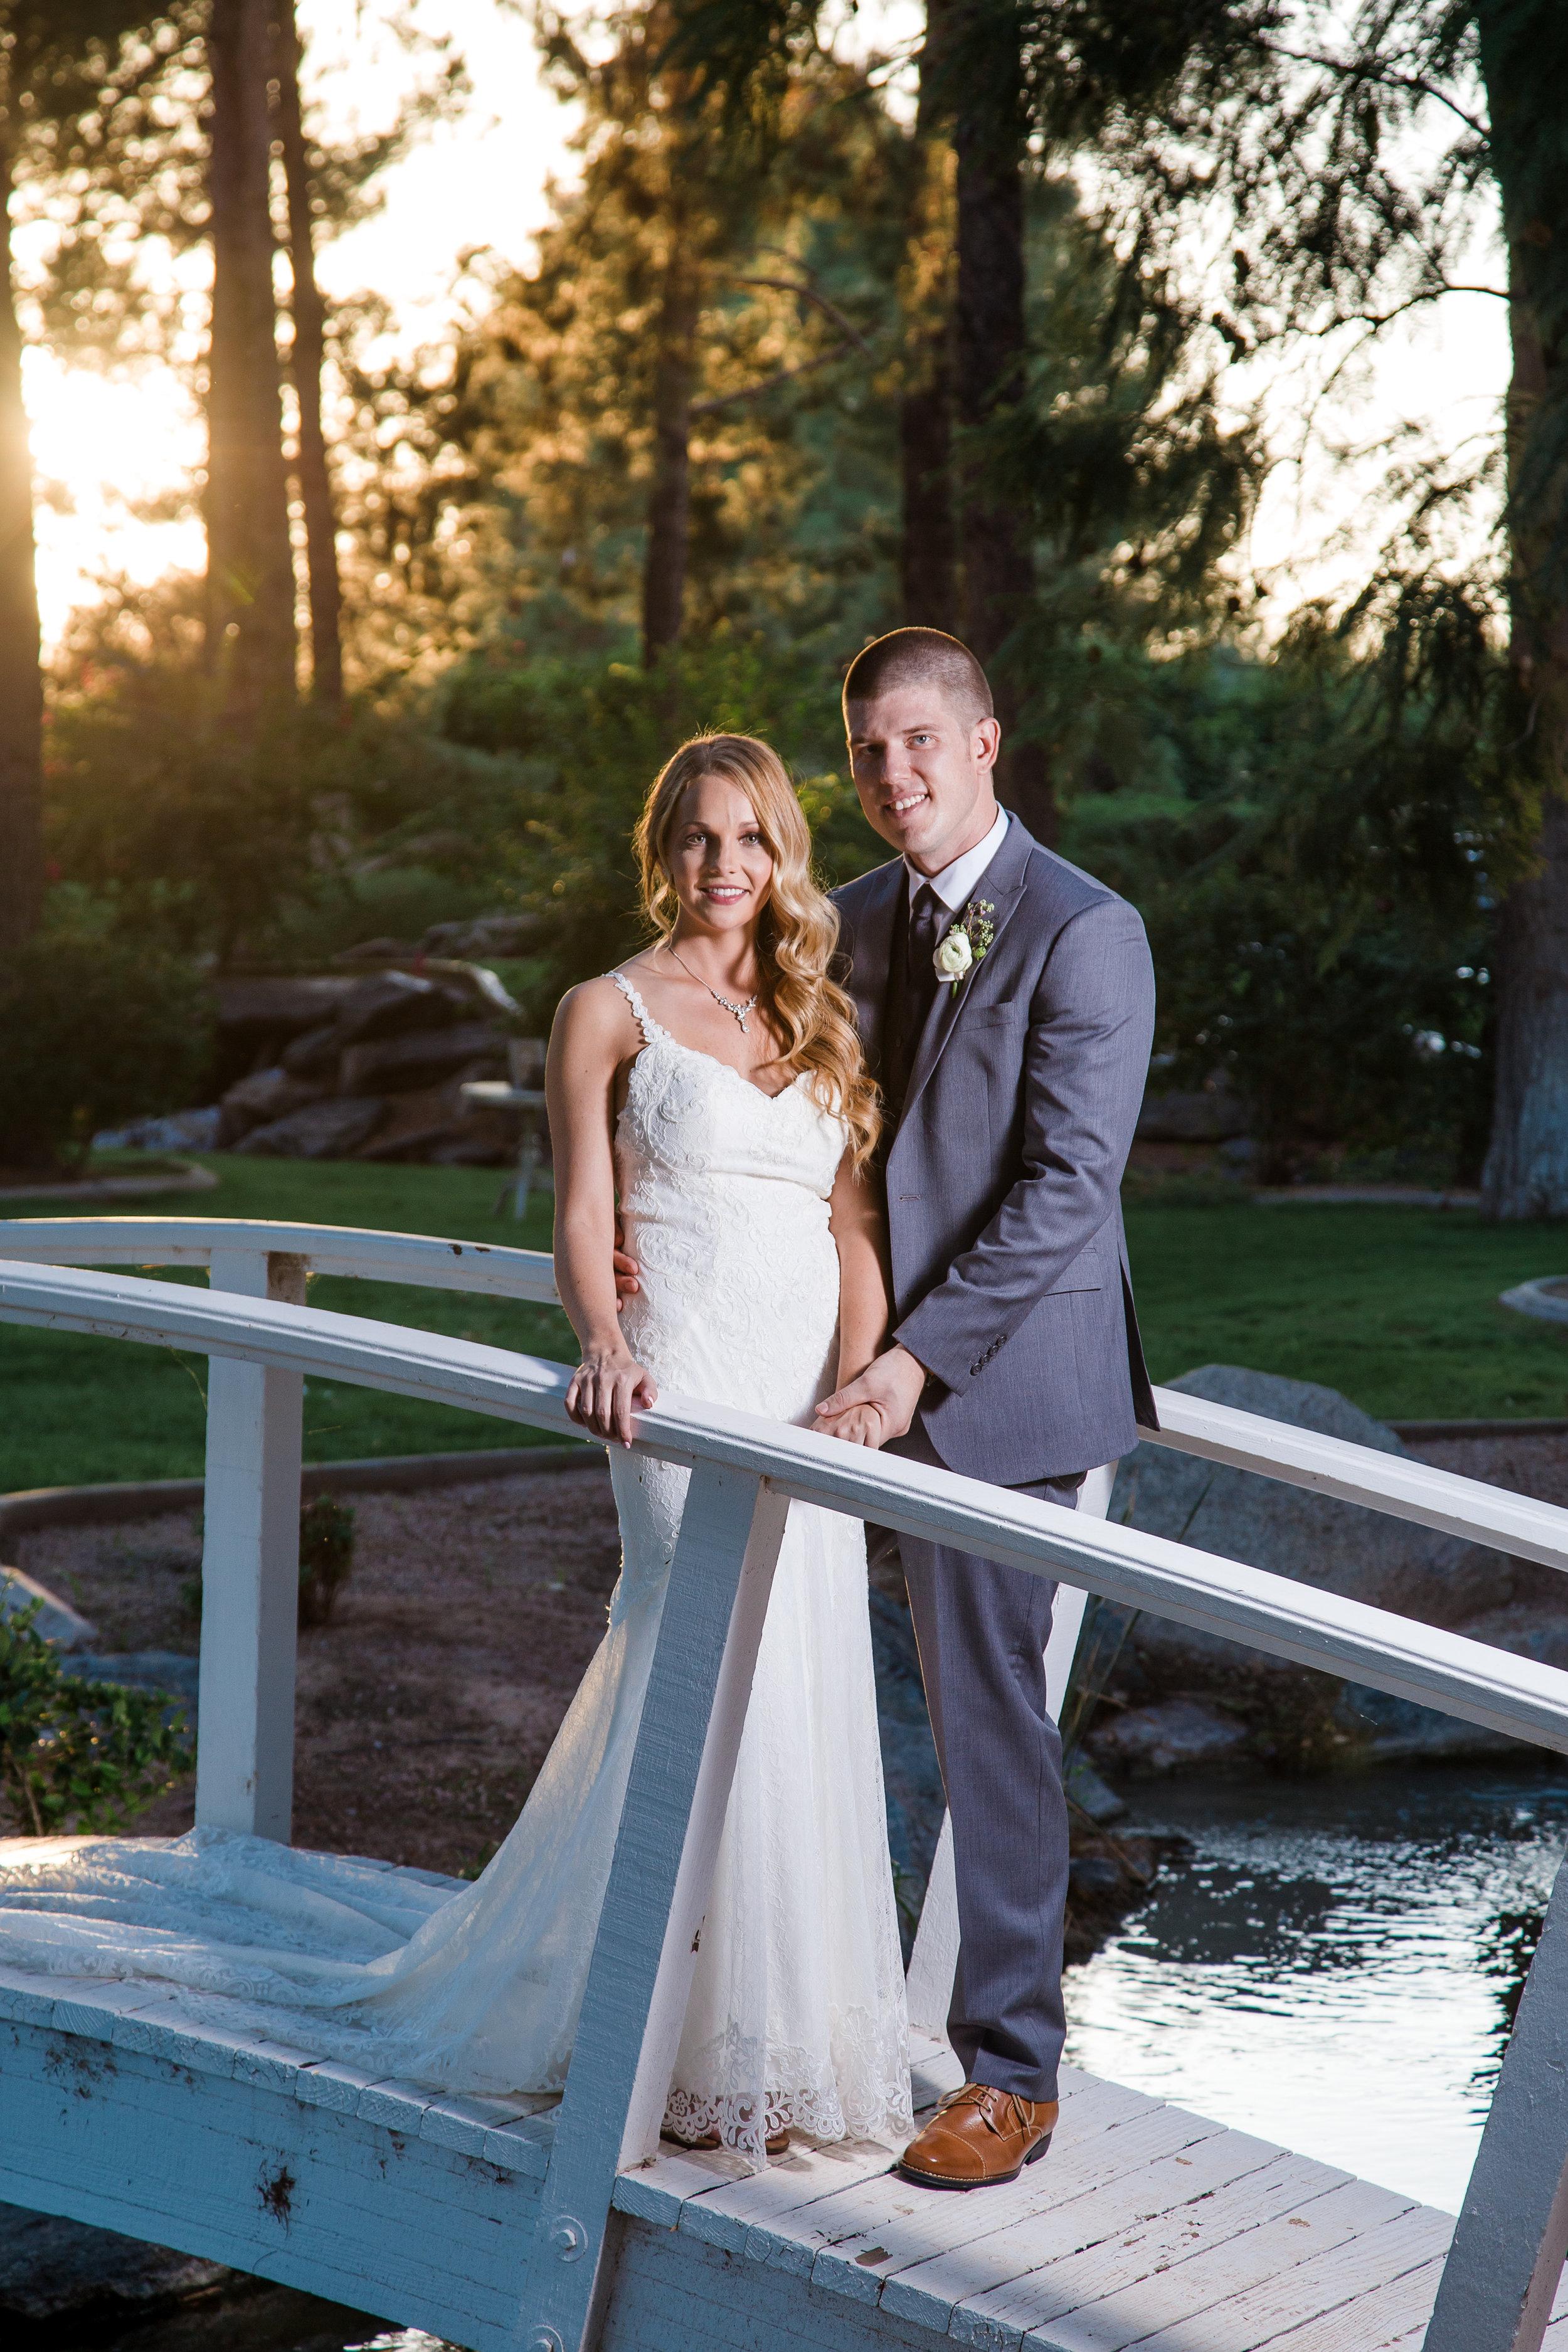 Bride and groom. Chateau de Vie, Chandler, Arizona wedding.